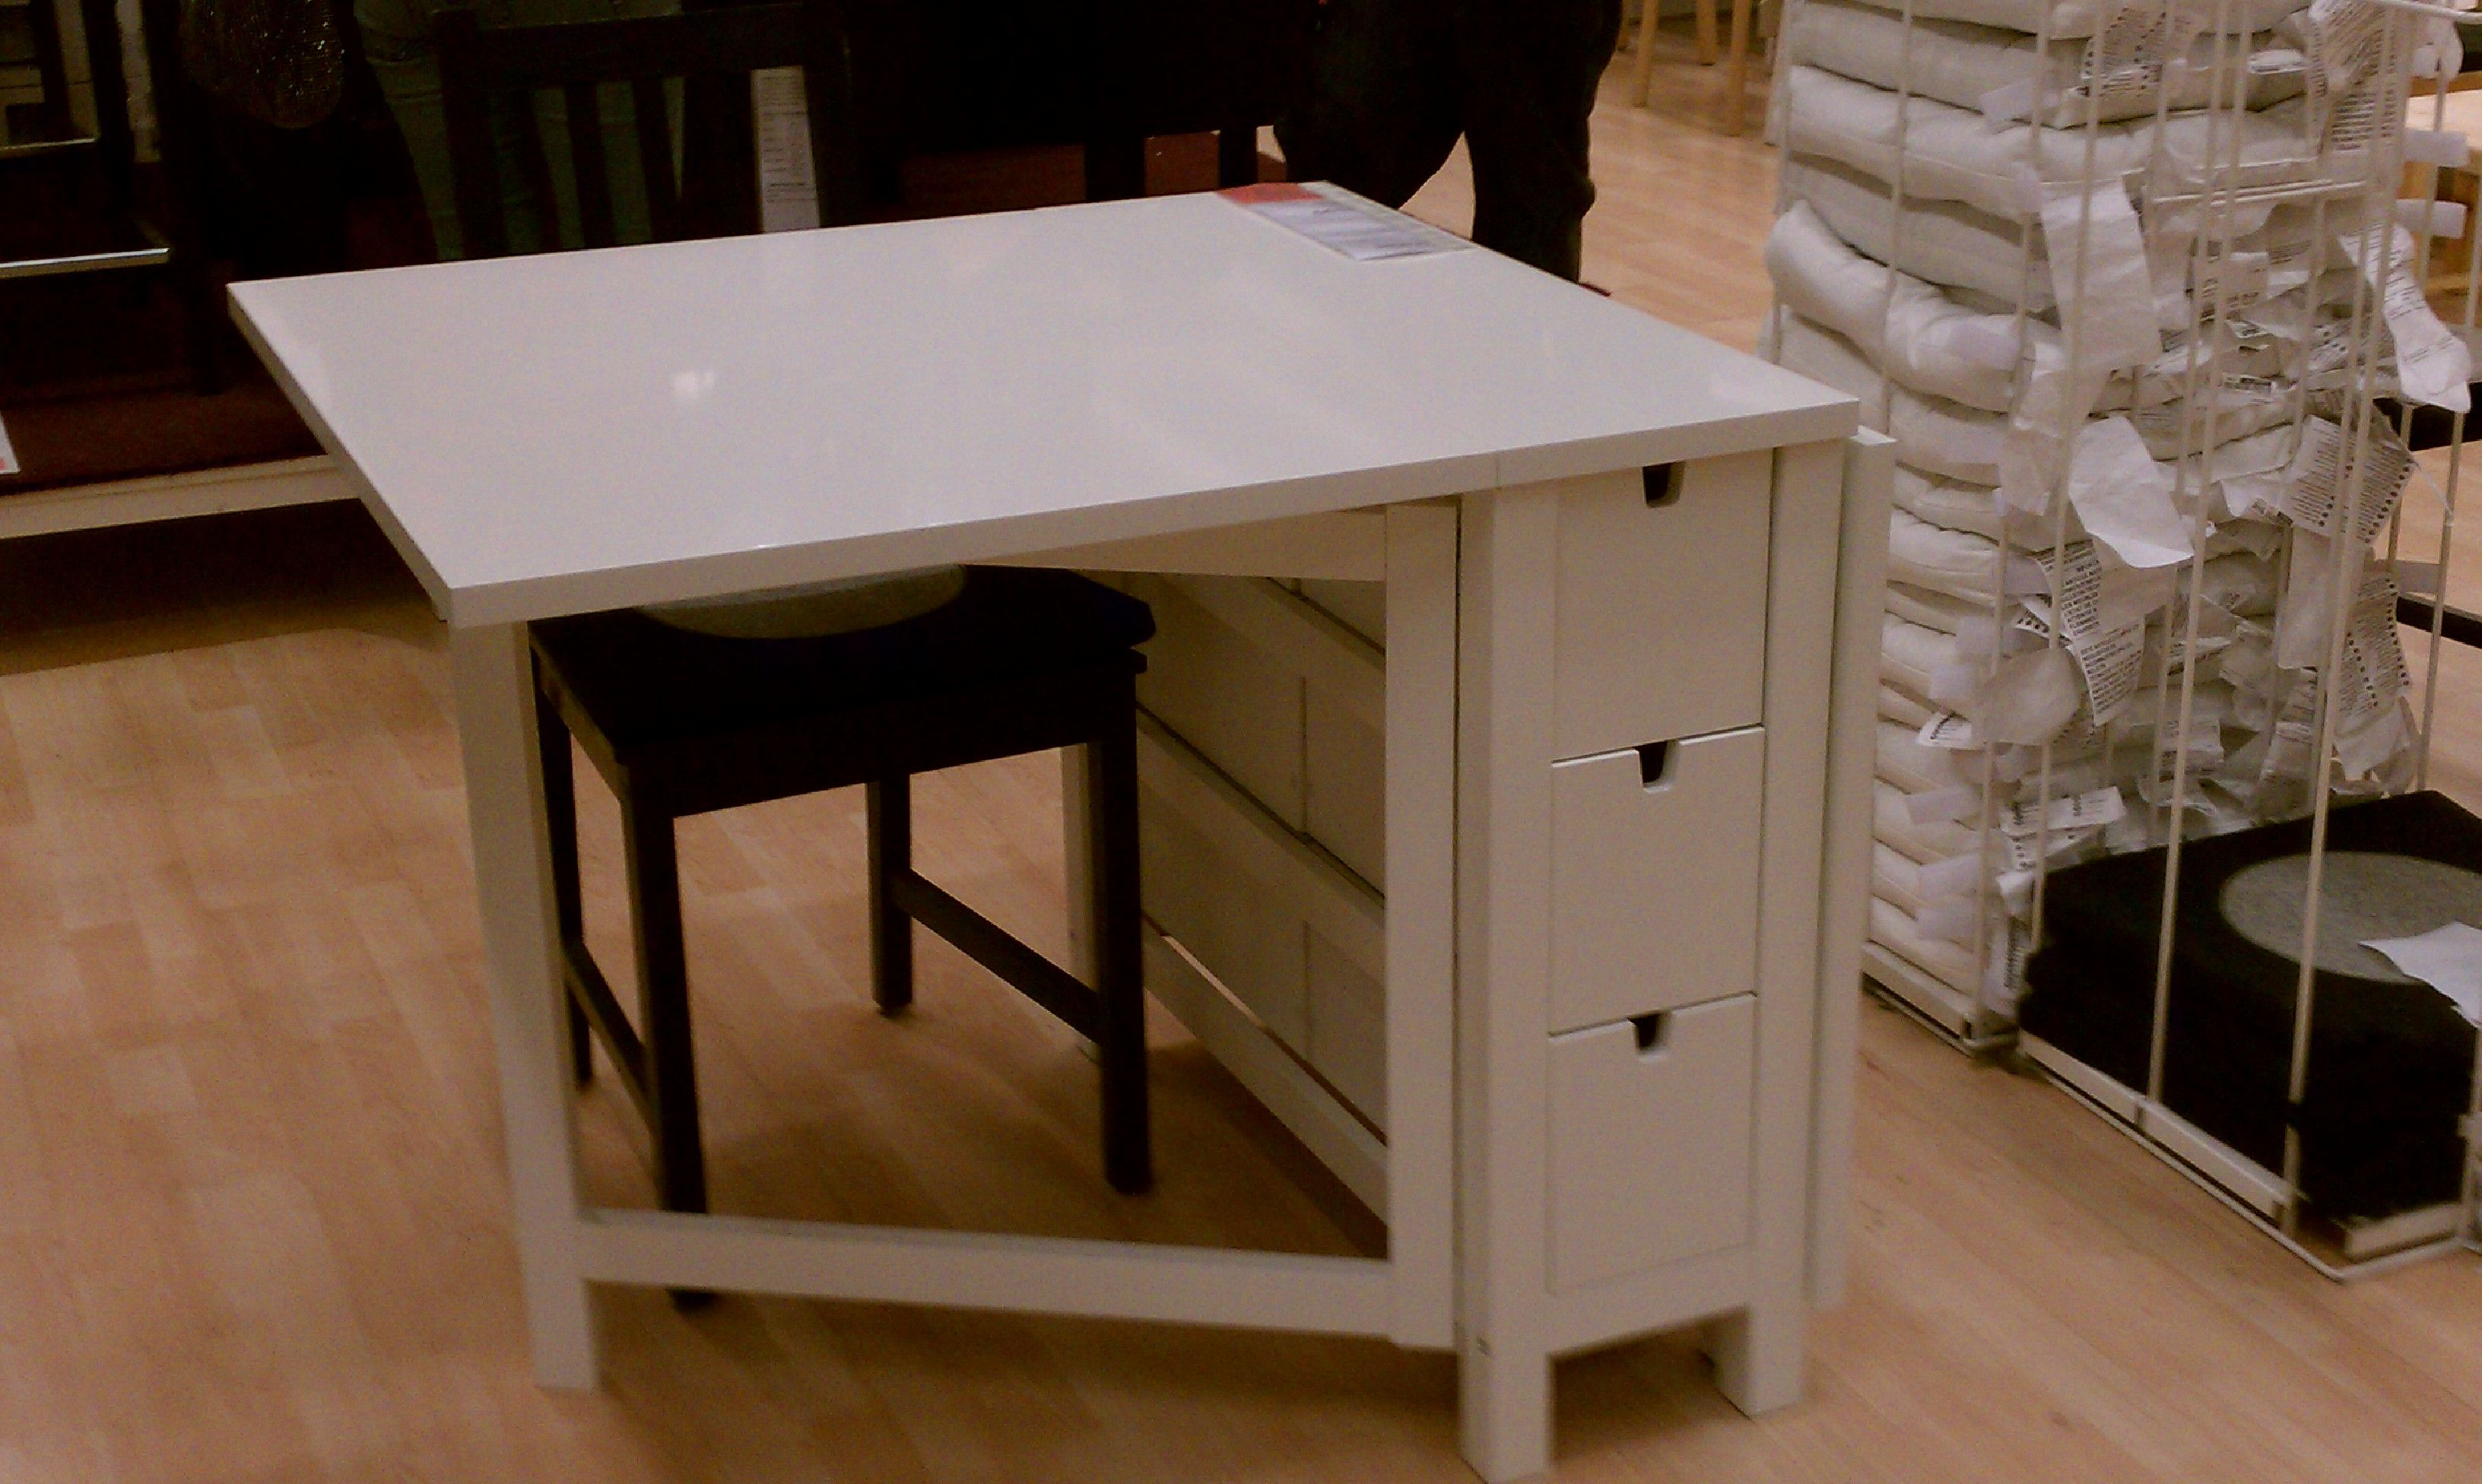 199 Norden Gateleg Table Ikea Home Office Diy Ideas